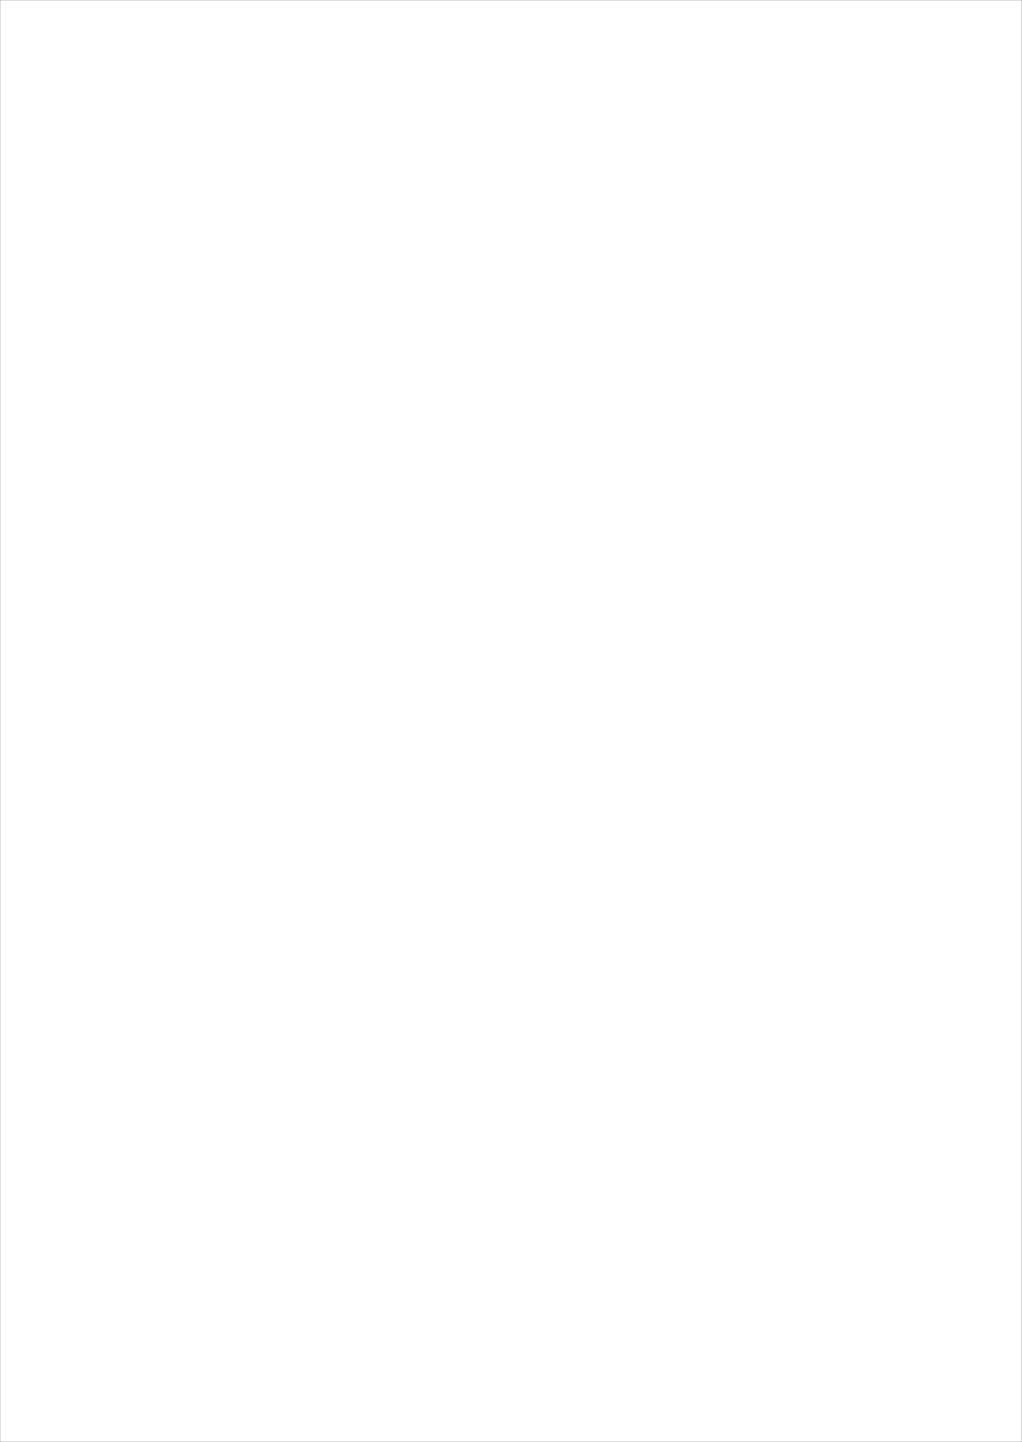 Kiyohime Lovers Vol. 01 - Kiyohime to Hajimete 1